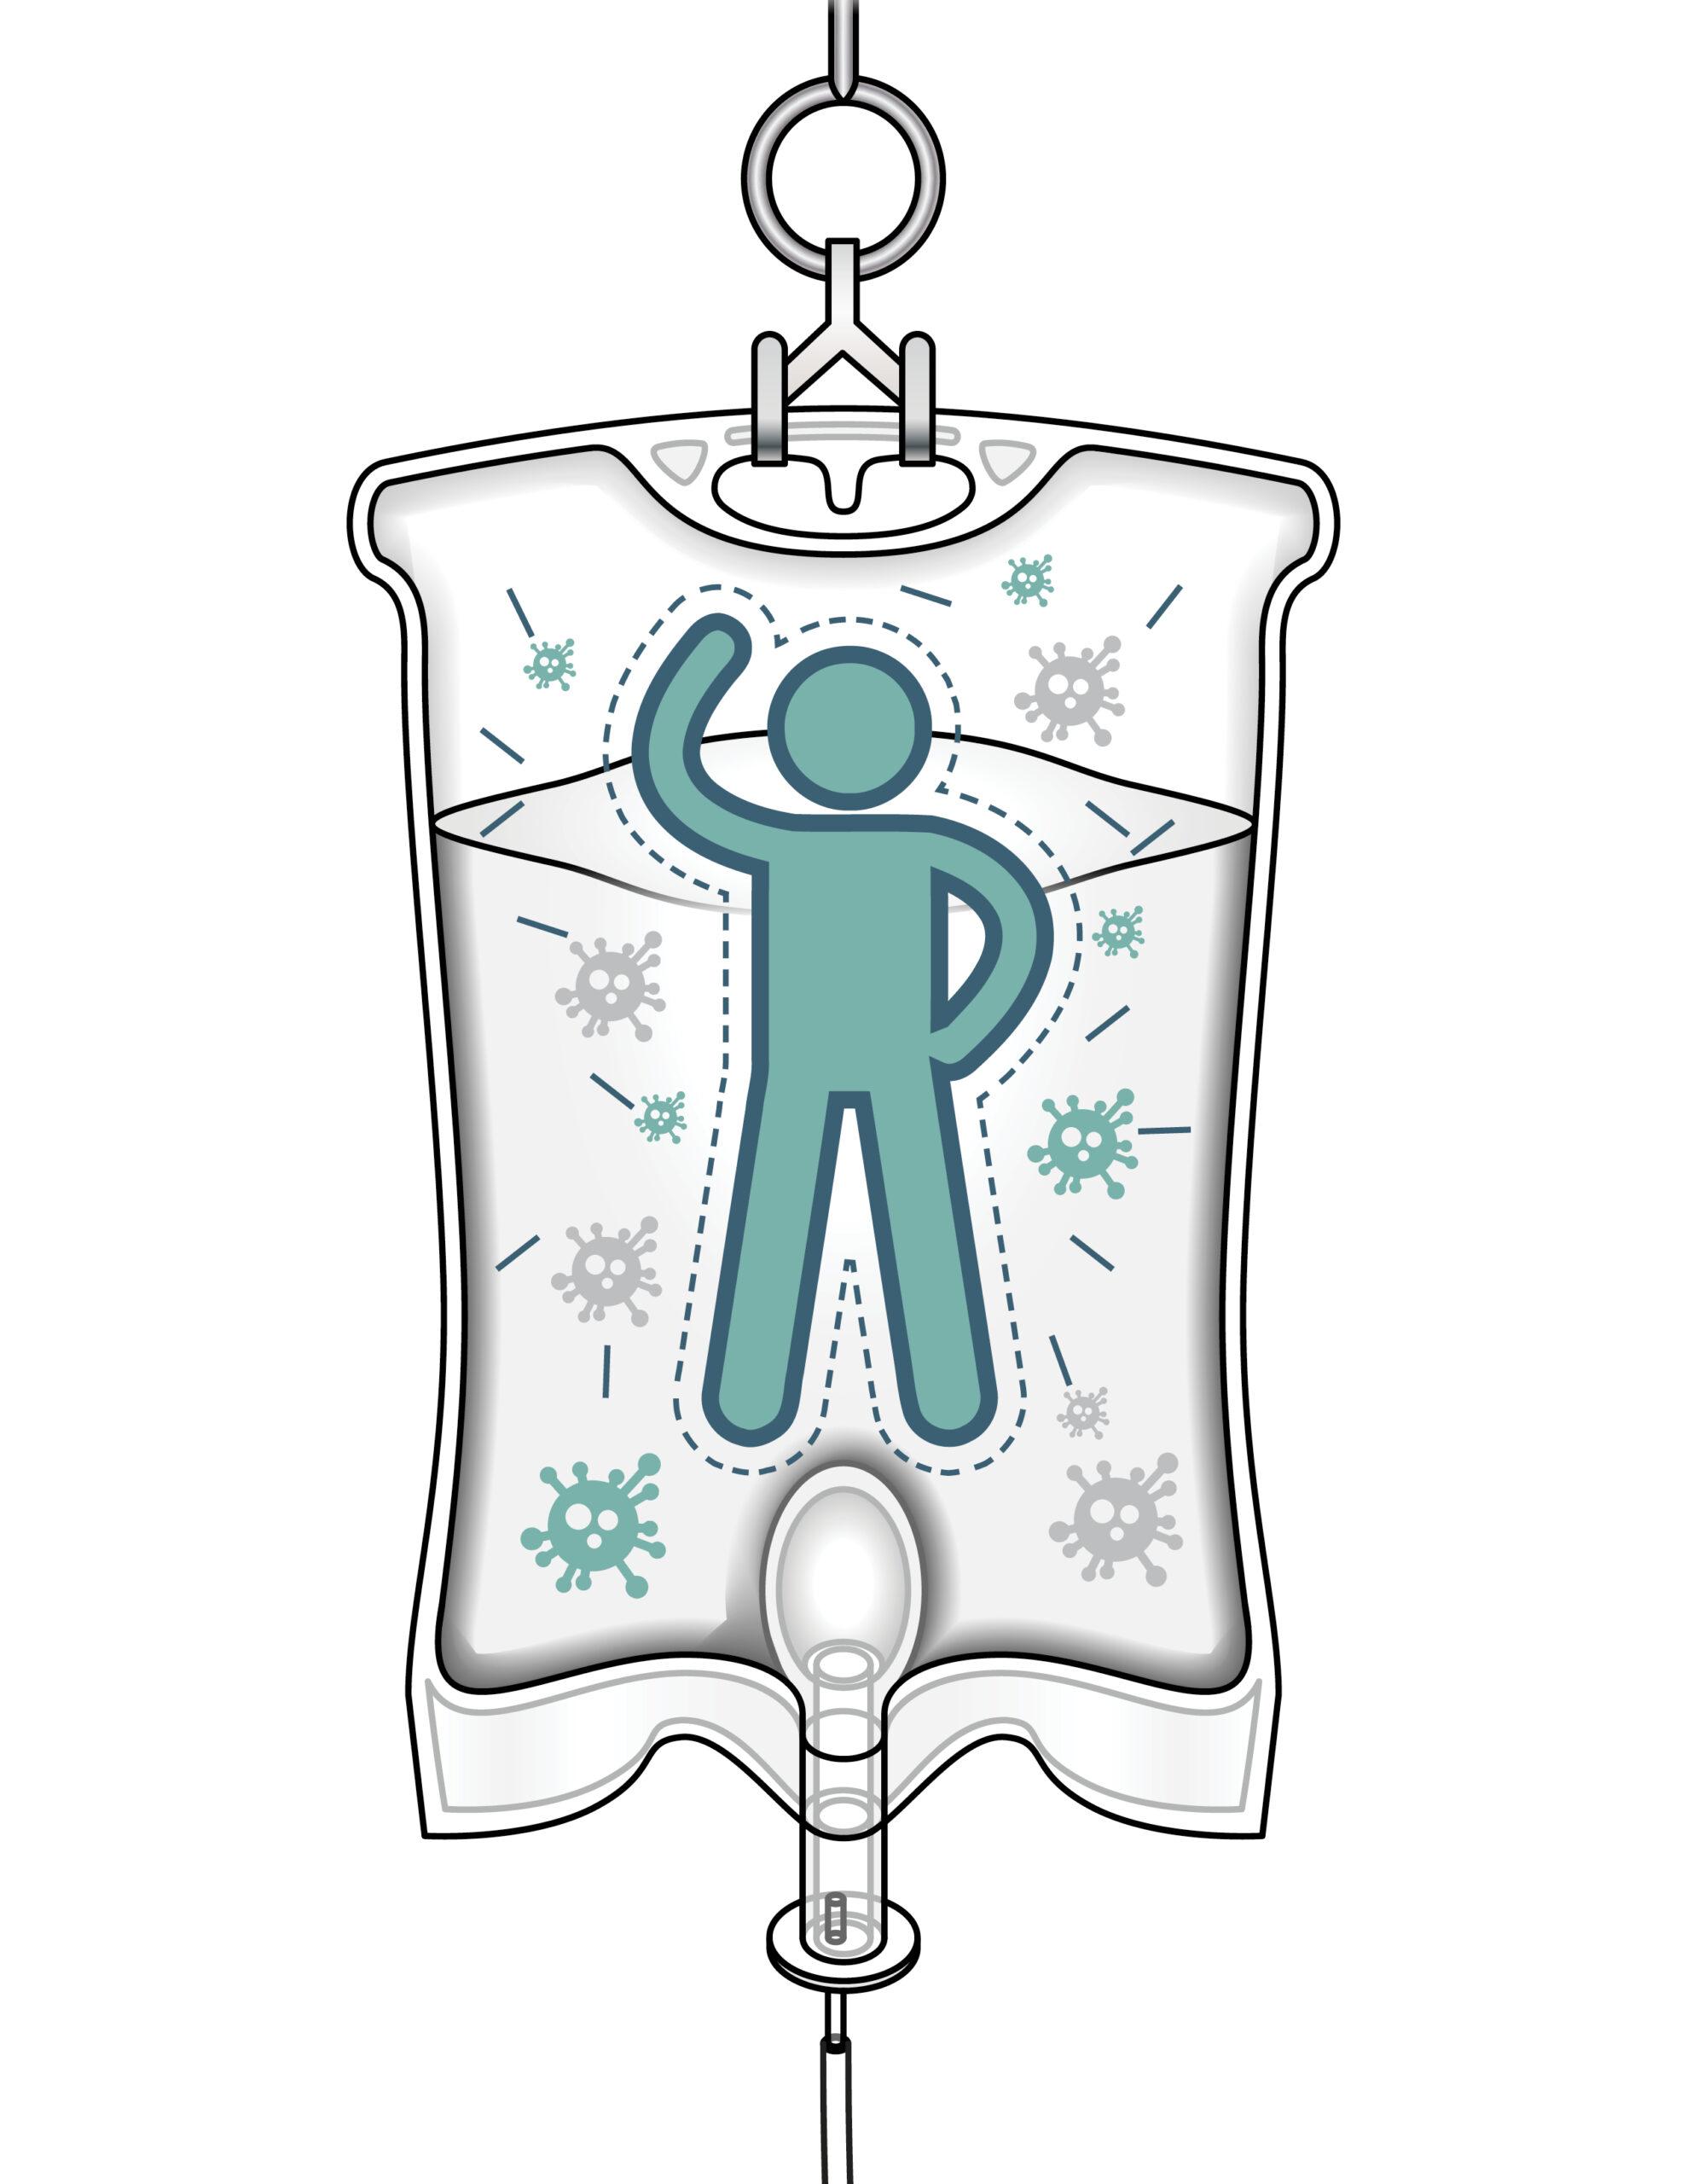 Immunity Max IV Treatment